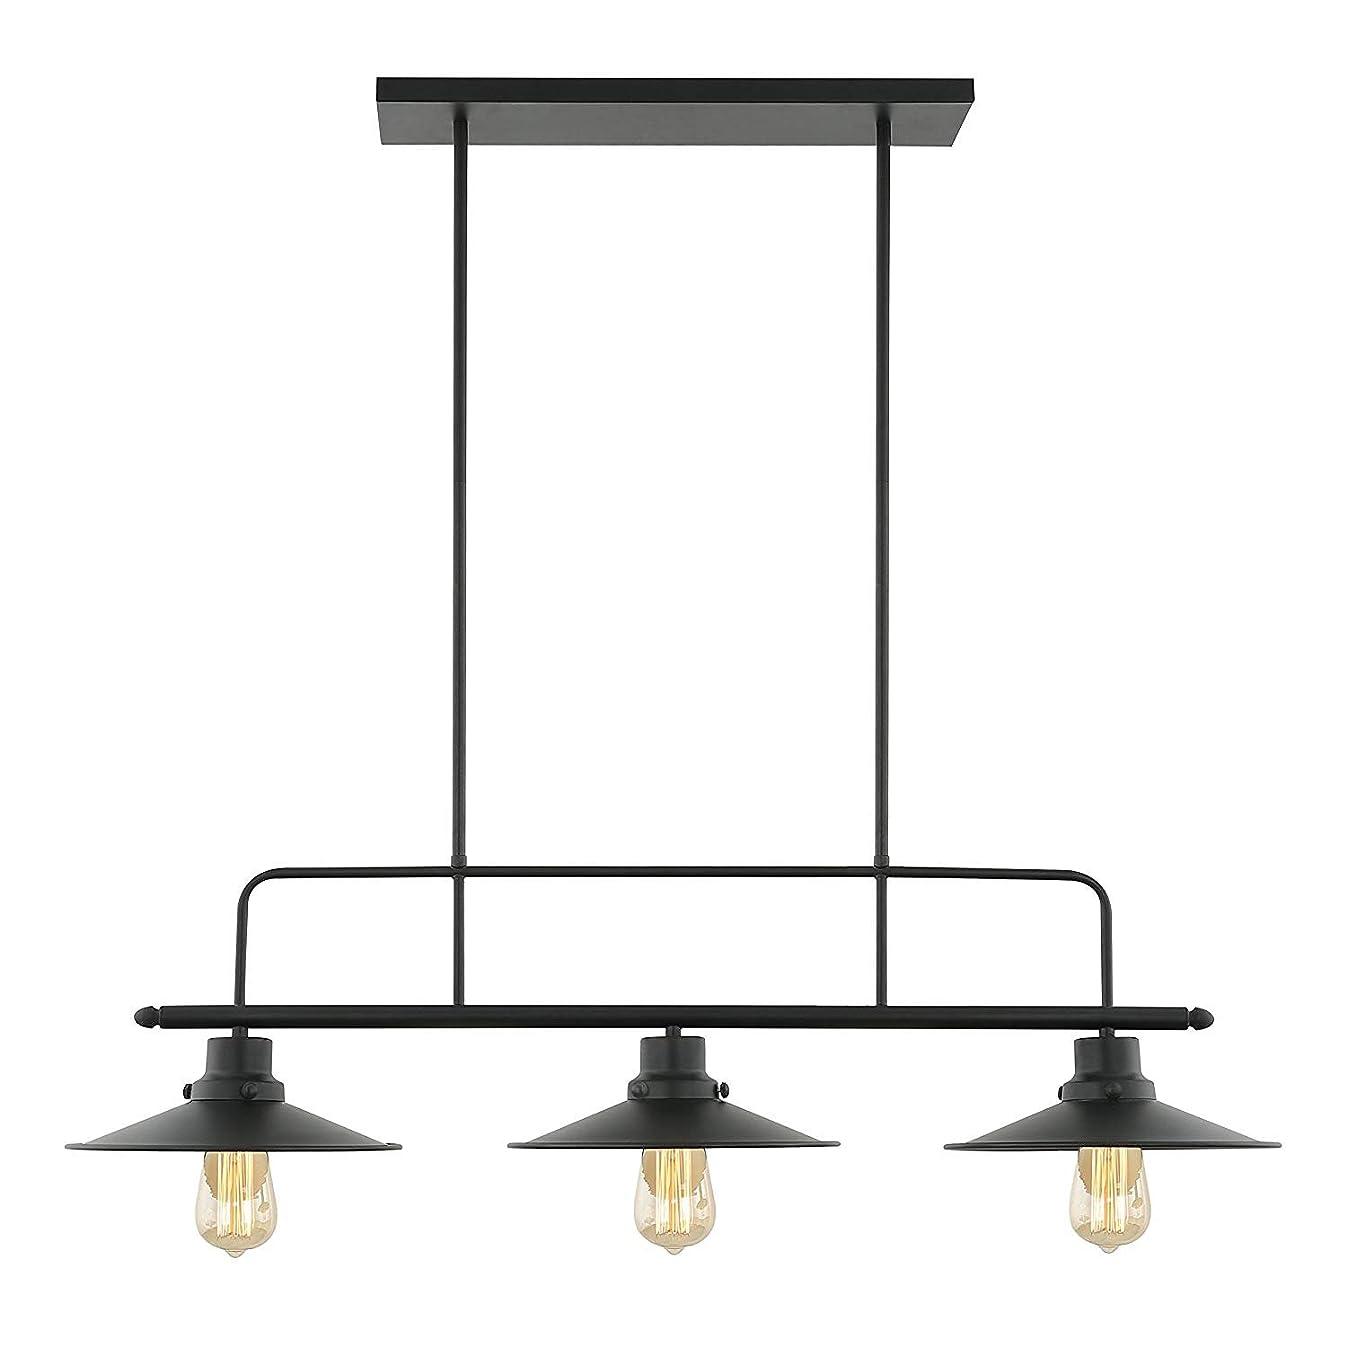 Light Society Margaux 3-Light Kitchen Island Pendant, Matte Black, Vintage Modern Industrial Chandelier (LS-C114)